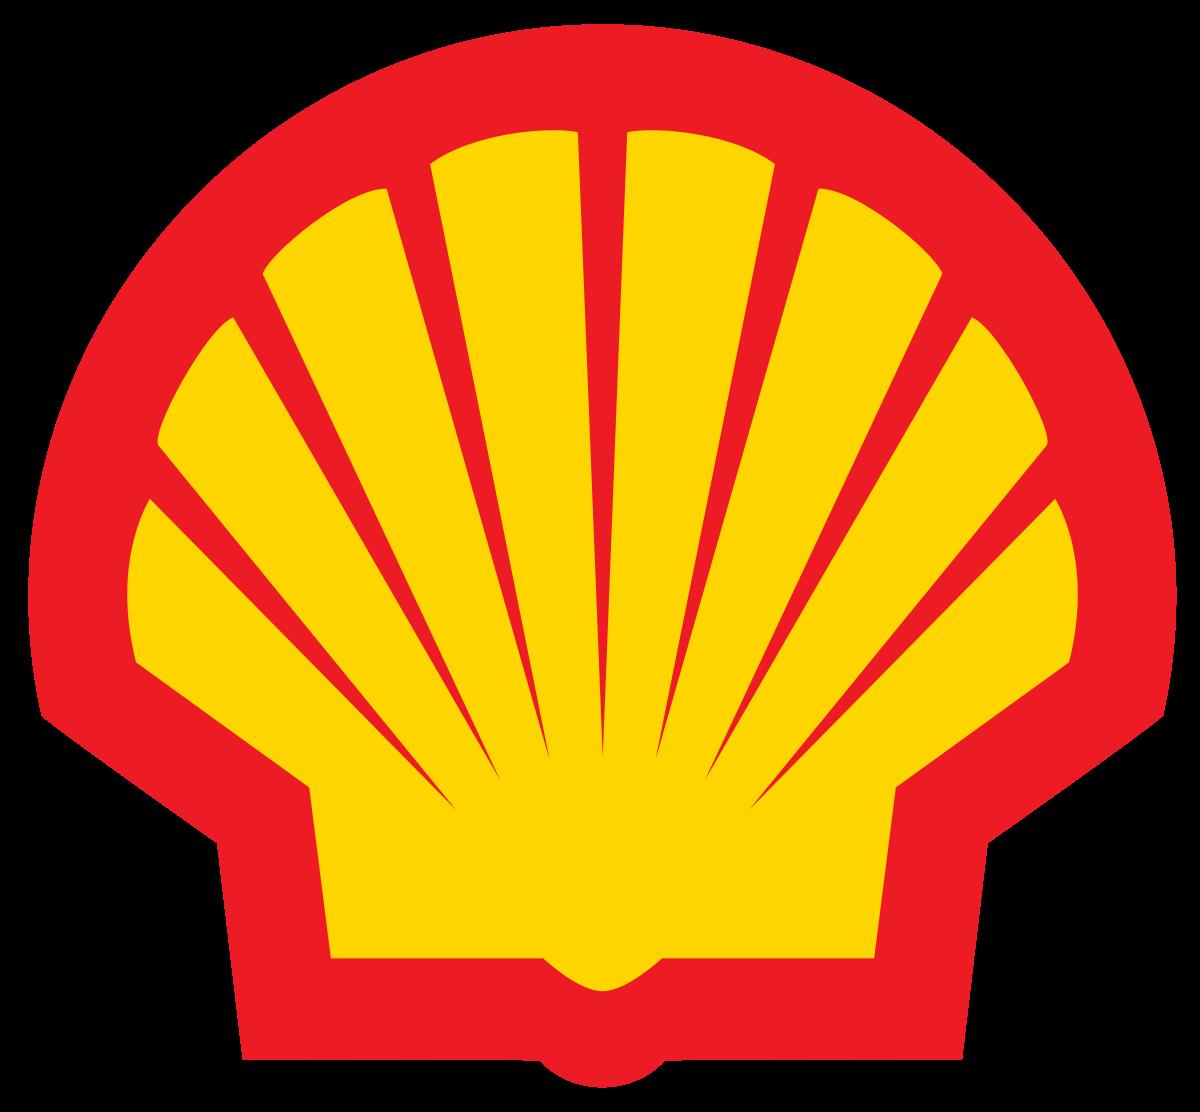 Exxonmobil clipart address png free stock Somalia strikes deal with Shell, ExxonMobil - Nigeria png free stock